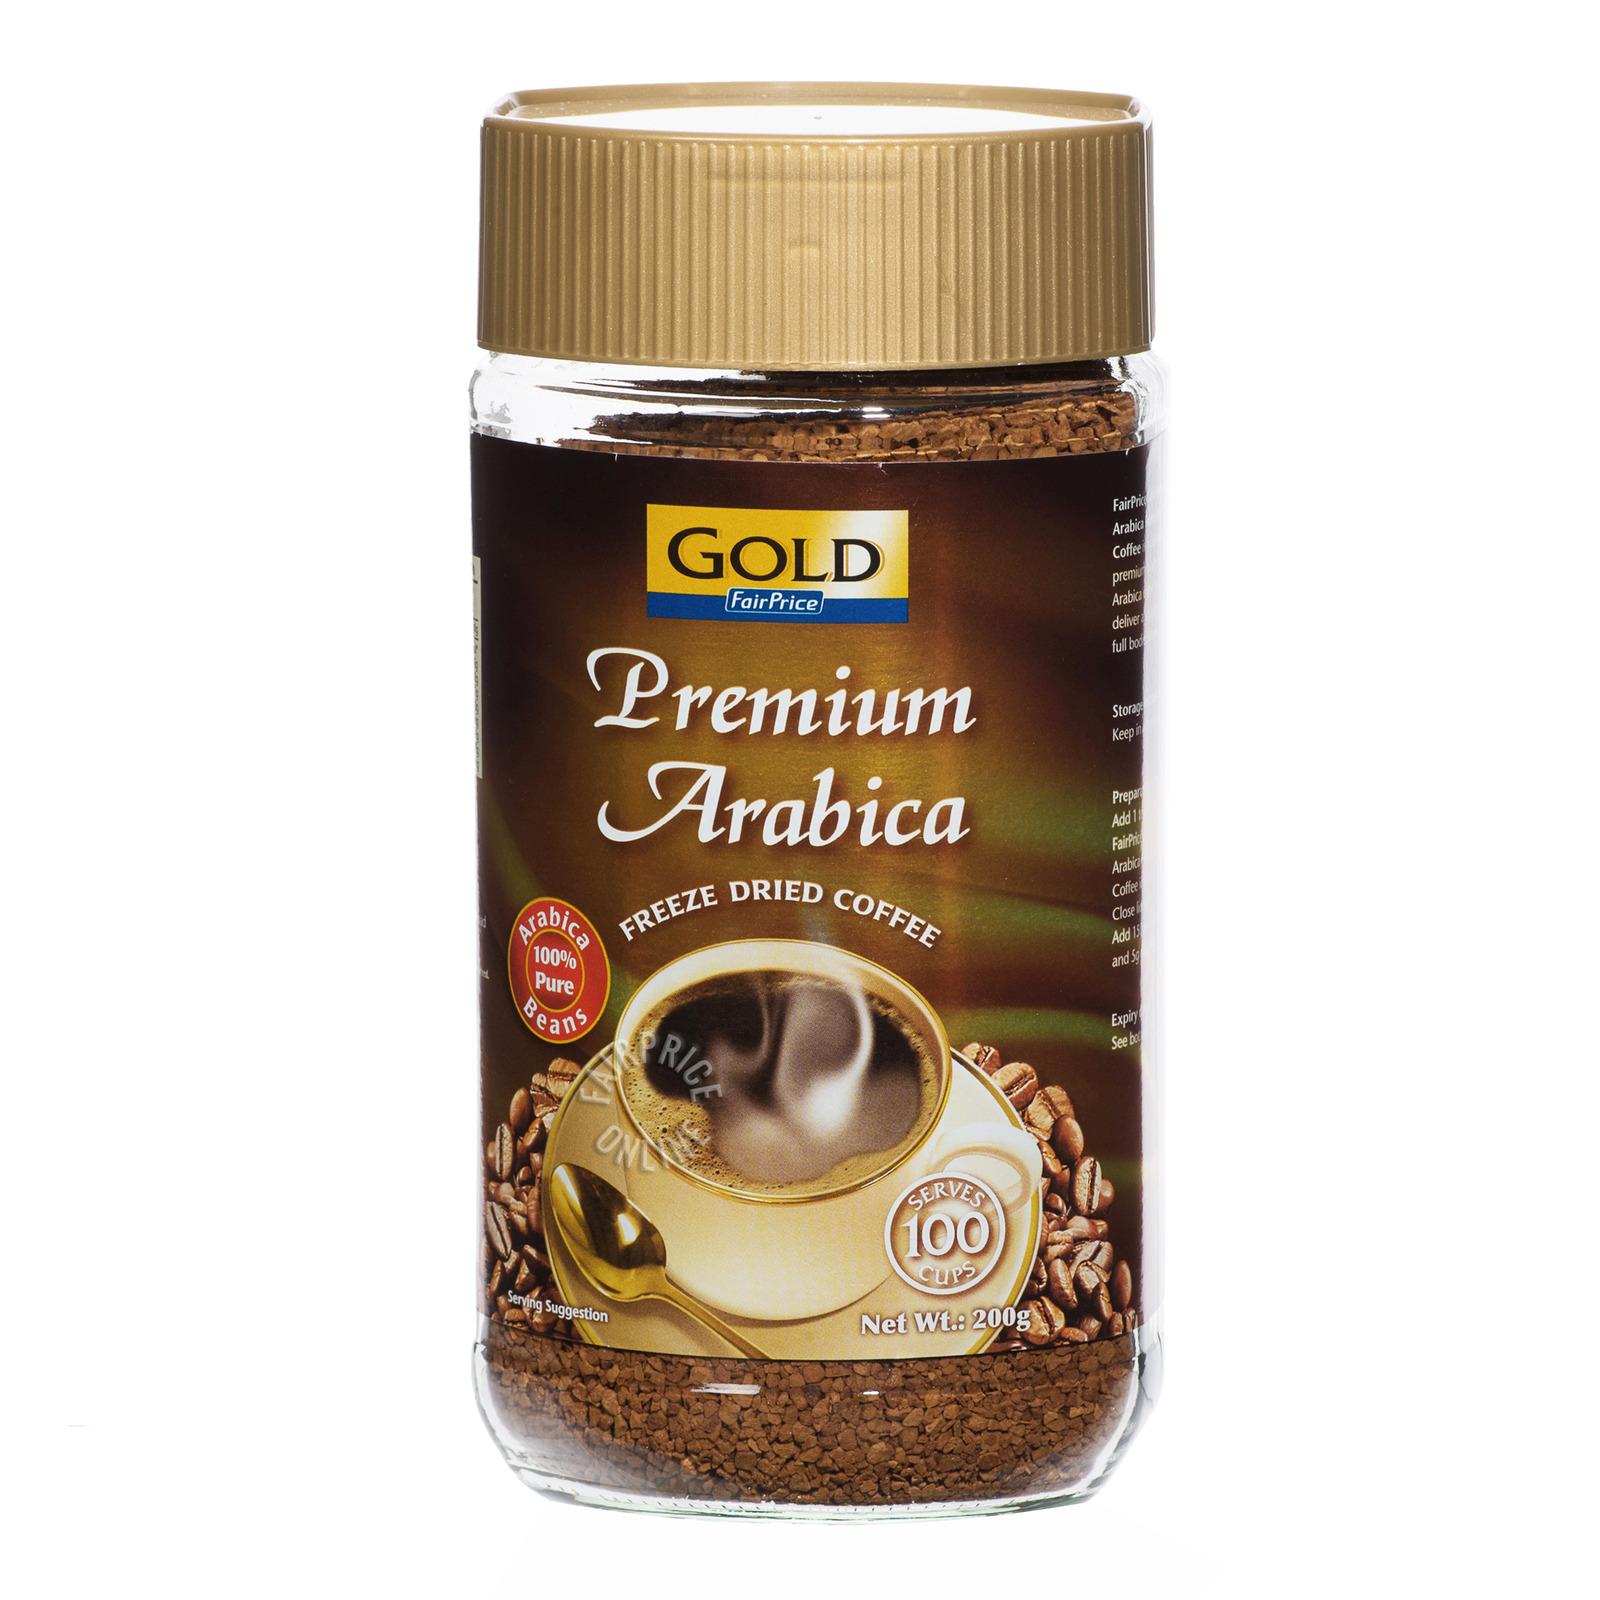 FairPrice Gold Premium Arabica Ground Coffee - Freeze Dried